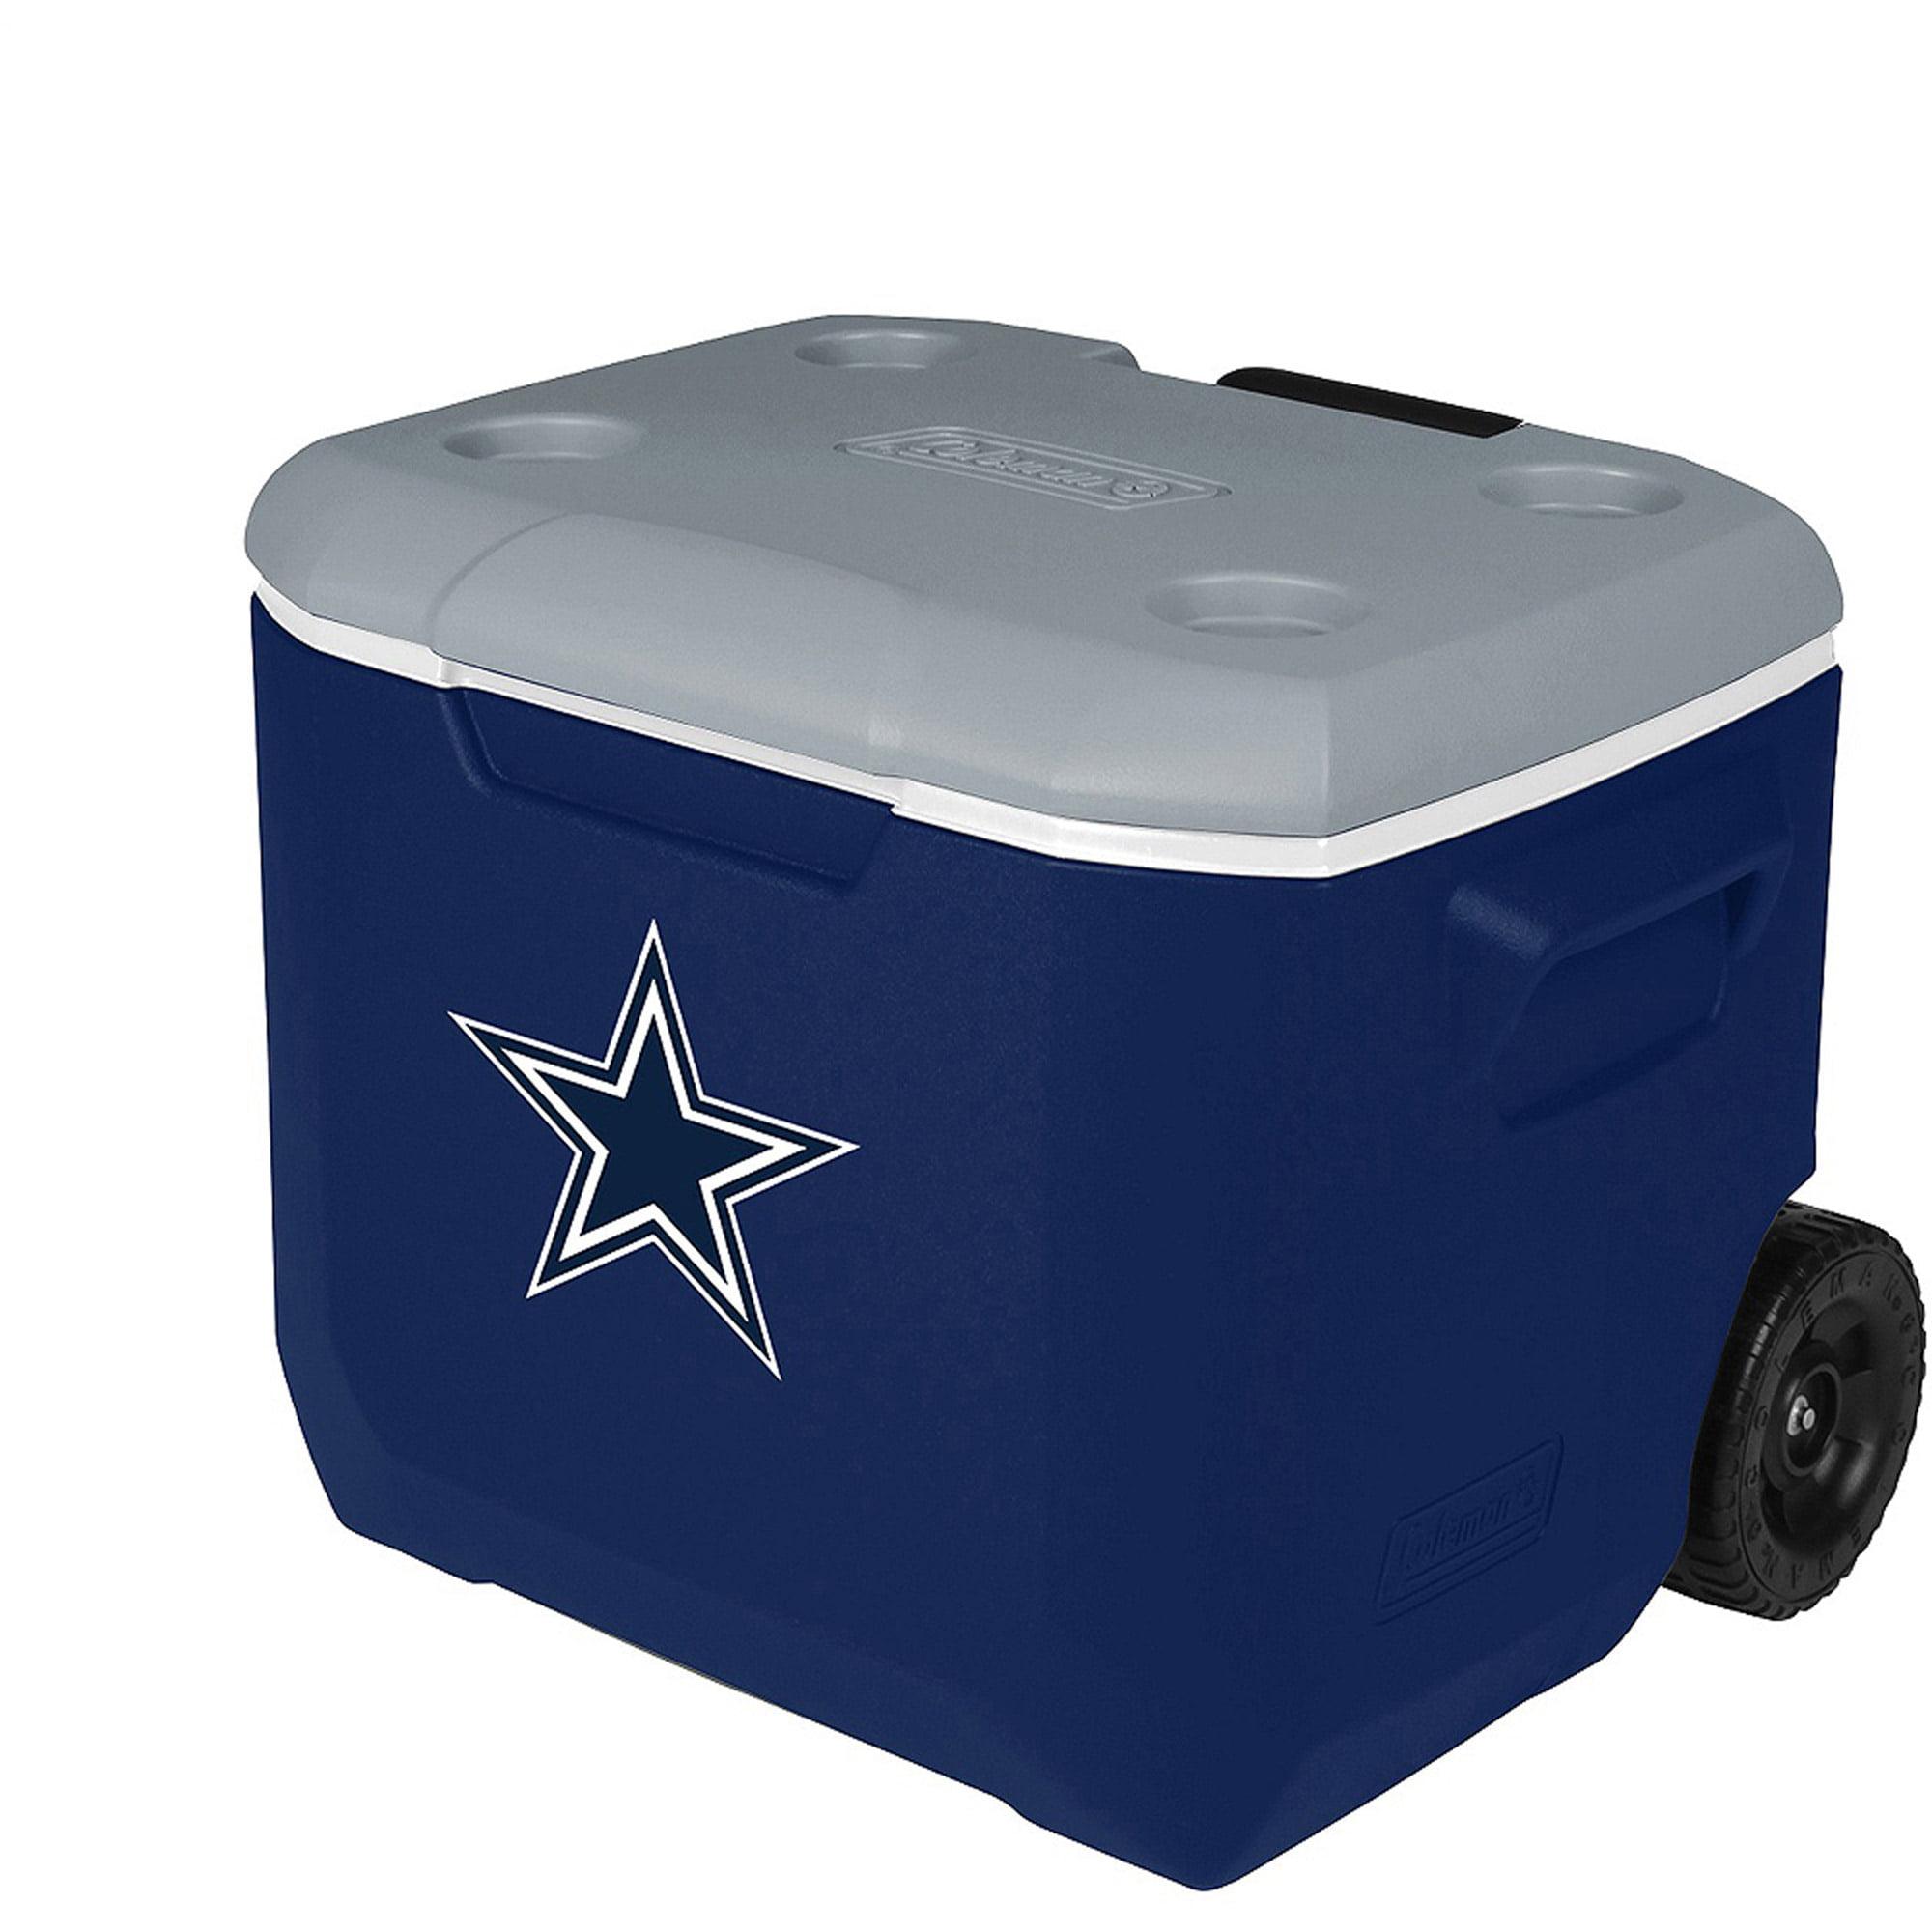 NFL Licensed TPU Lamination Waterproof Furniture Protector Sofa